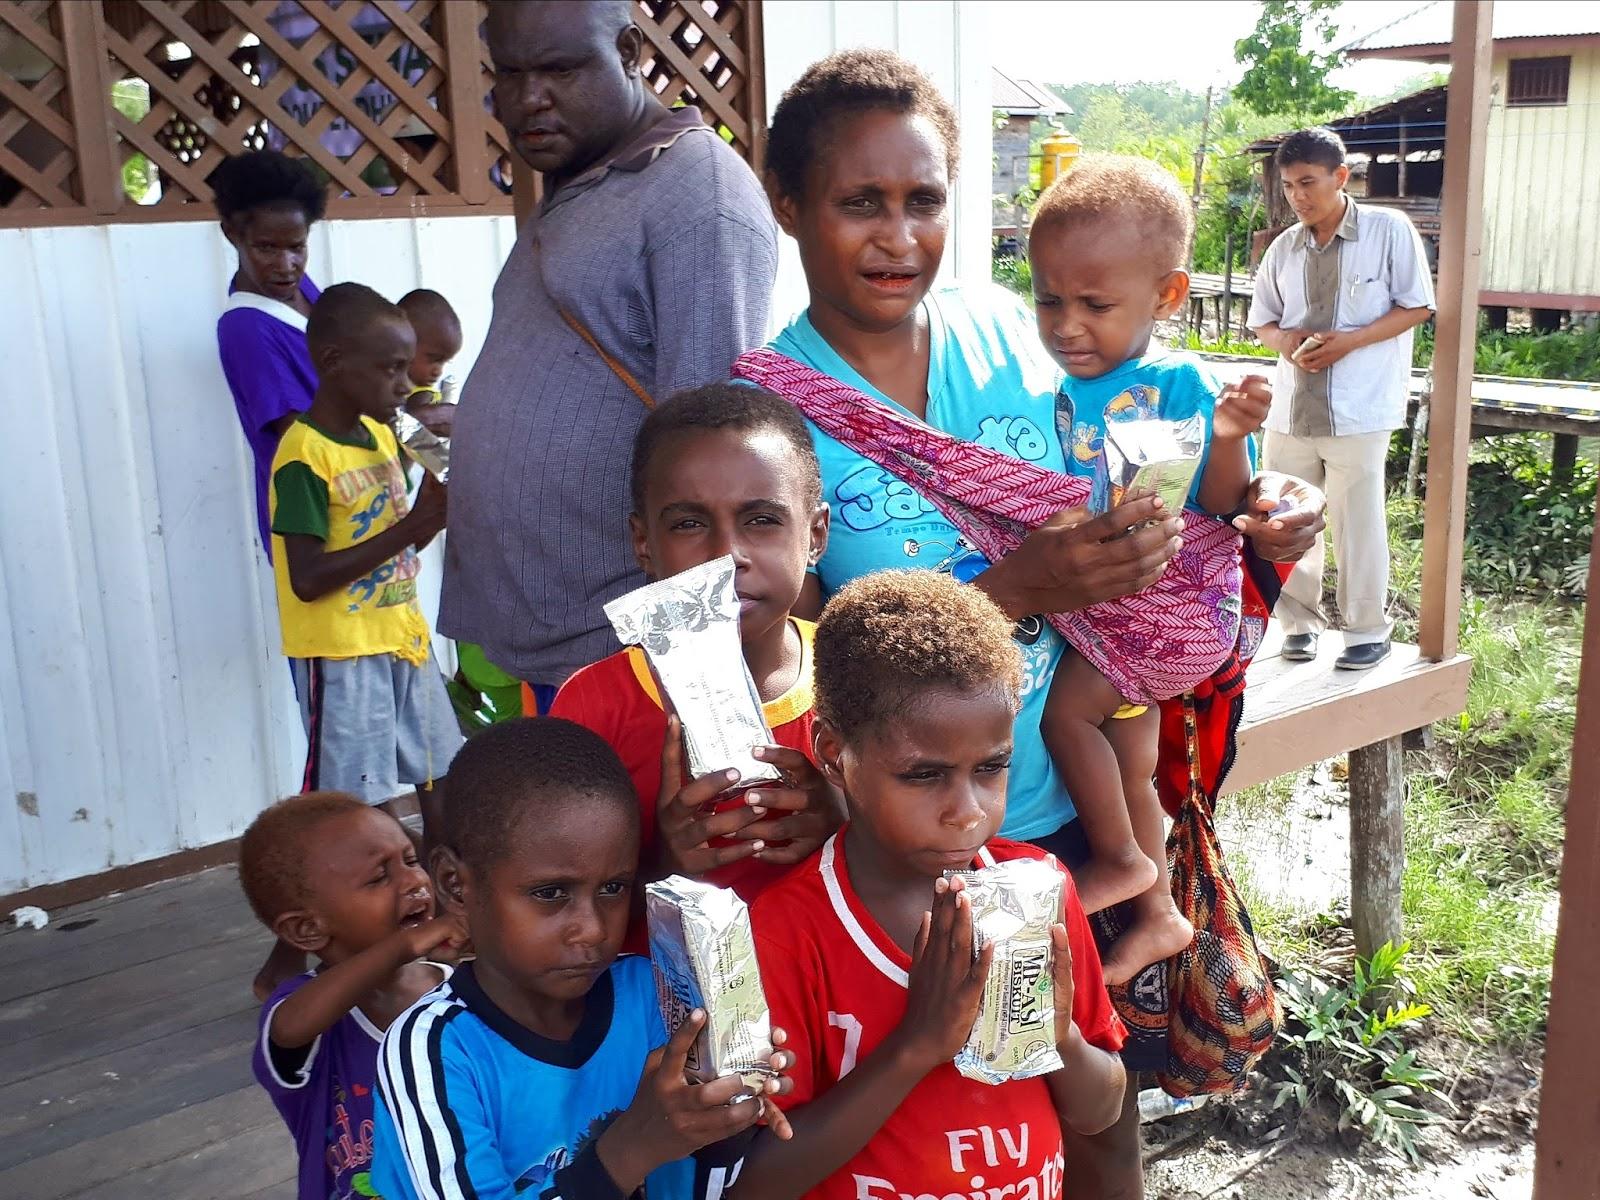 Kartini Modern Harus Sehat My Story Journey Produk Ukm Bumn Frozen Tahu Baxo Satu Keluarga Memiliki Banyak Anak